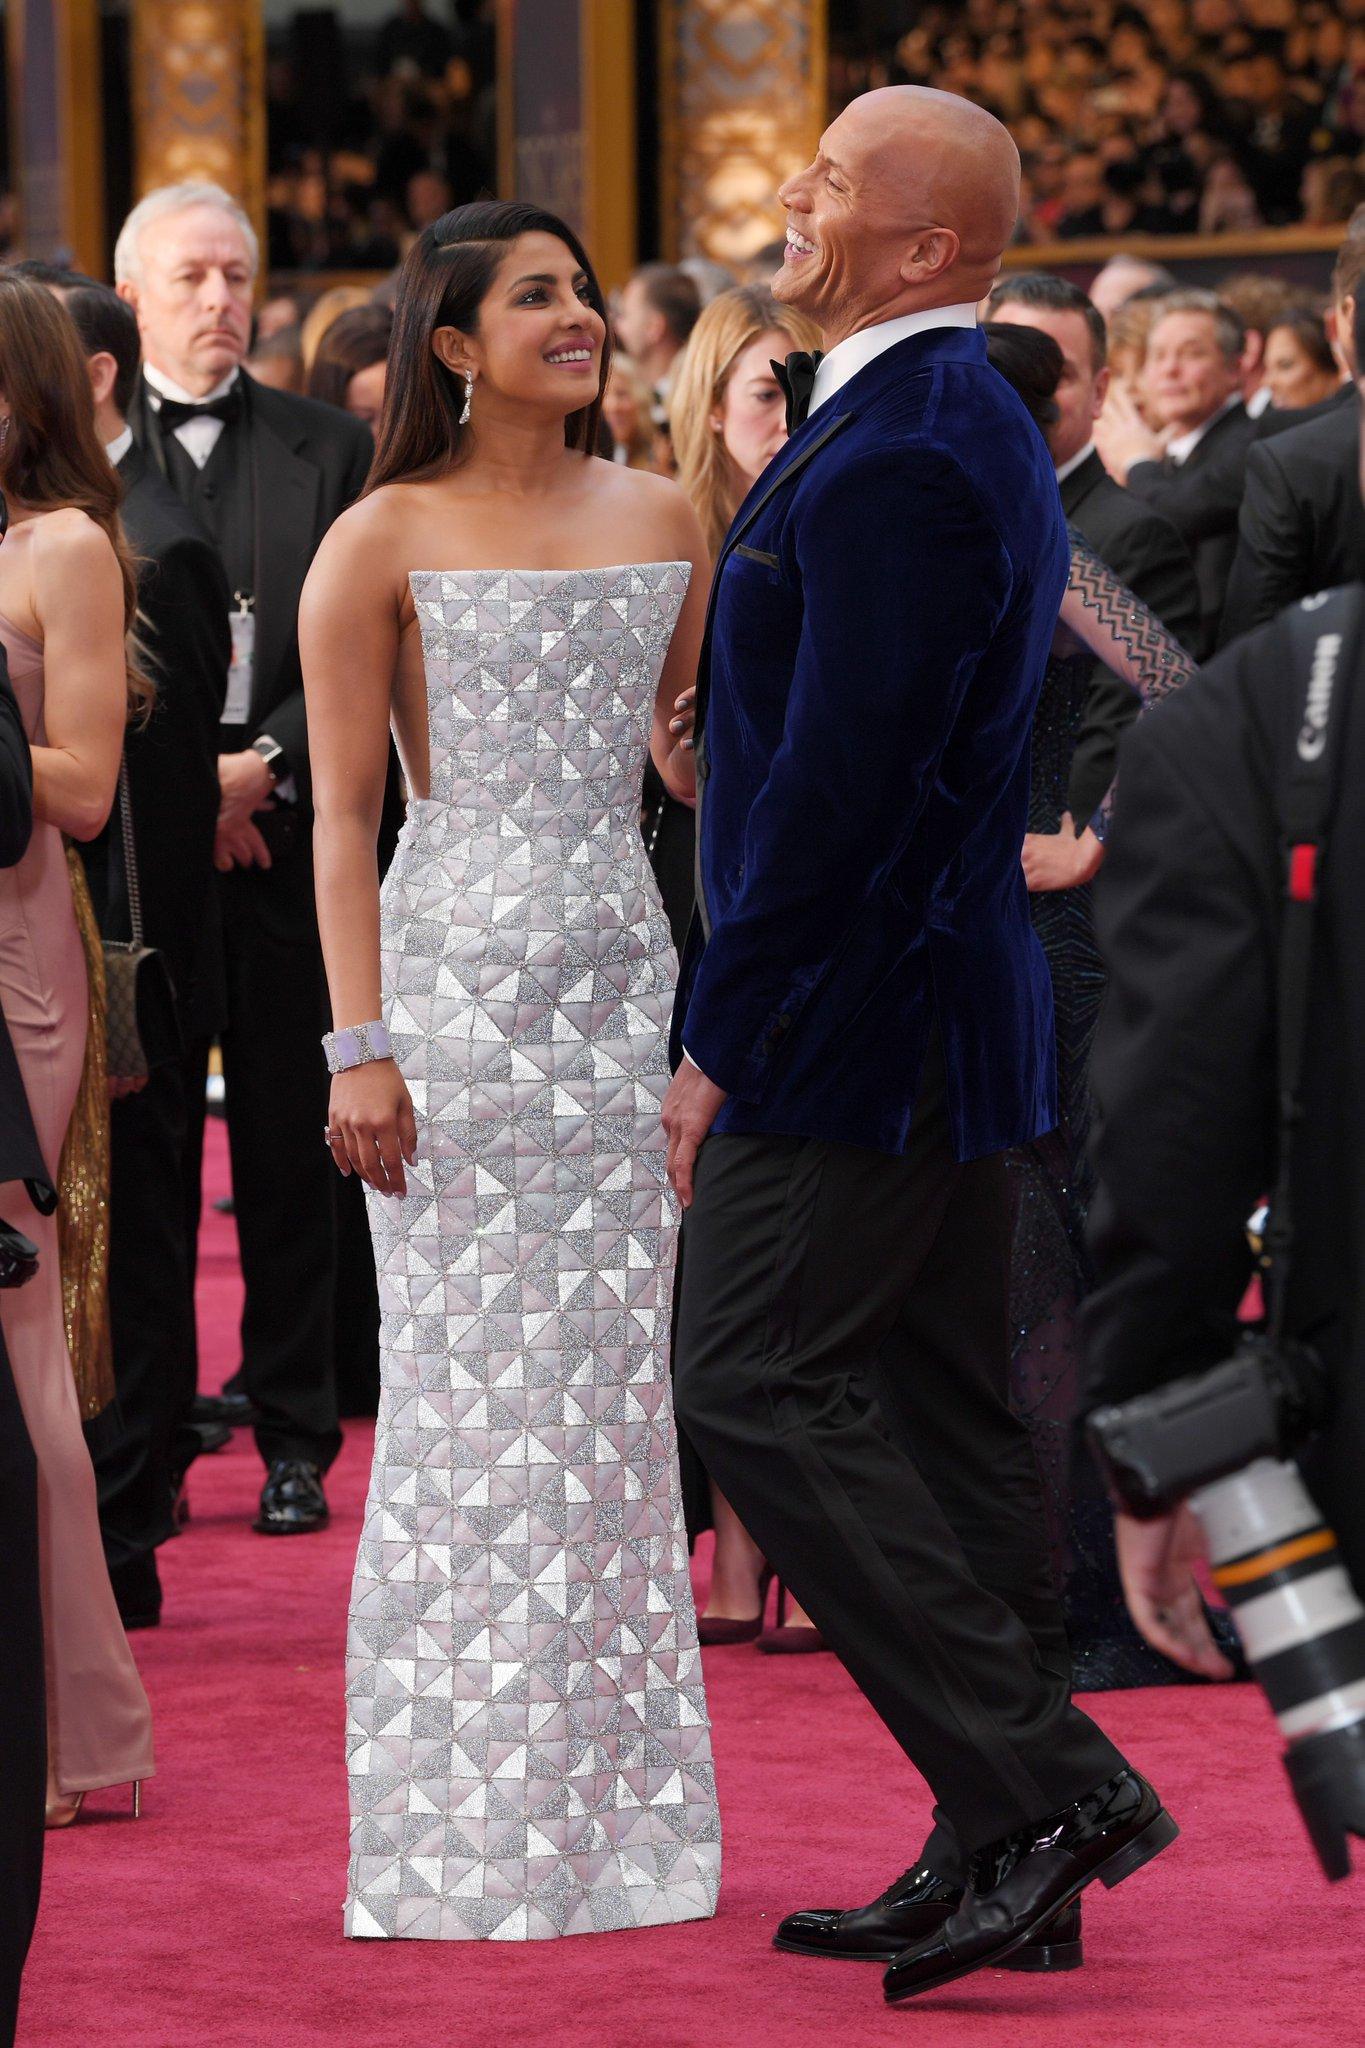 Priyanka Chopra and Dwayne @TheRock Johnson had a #Baywatch reunion at the #Oscars https://t.co/CE9NWs6paT https://t.co/xR0K4ajvJj